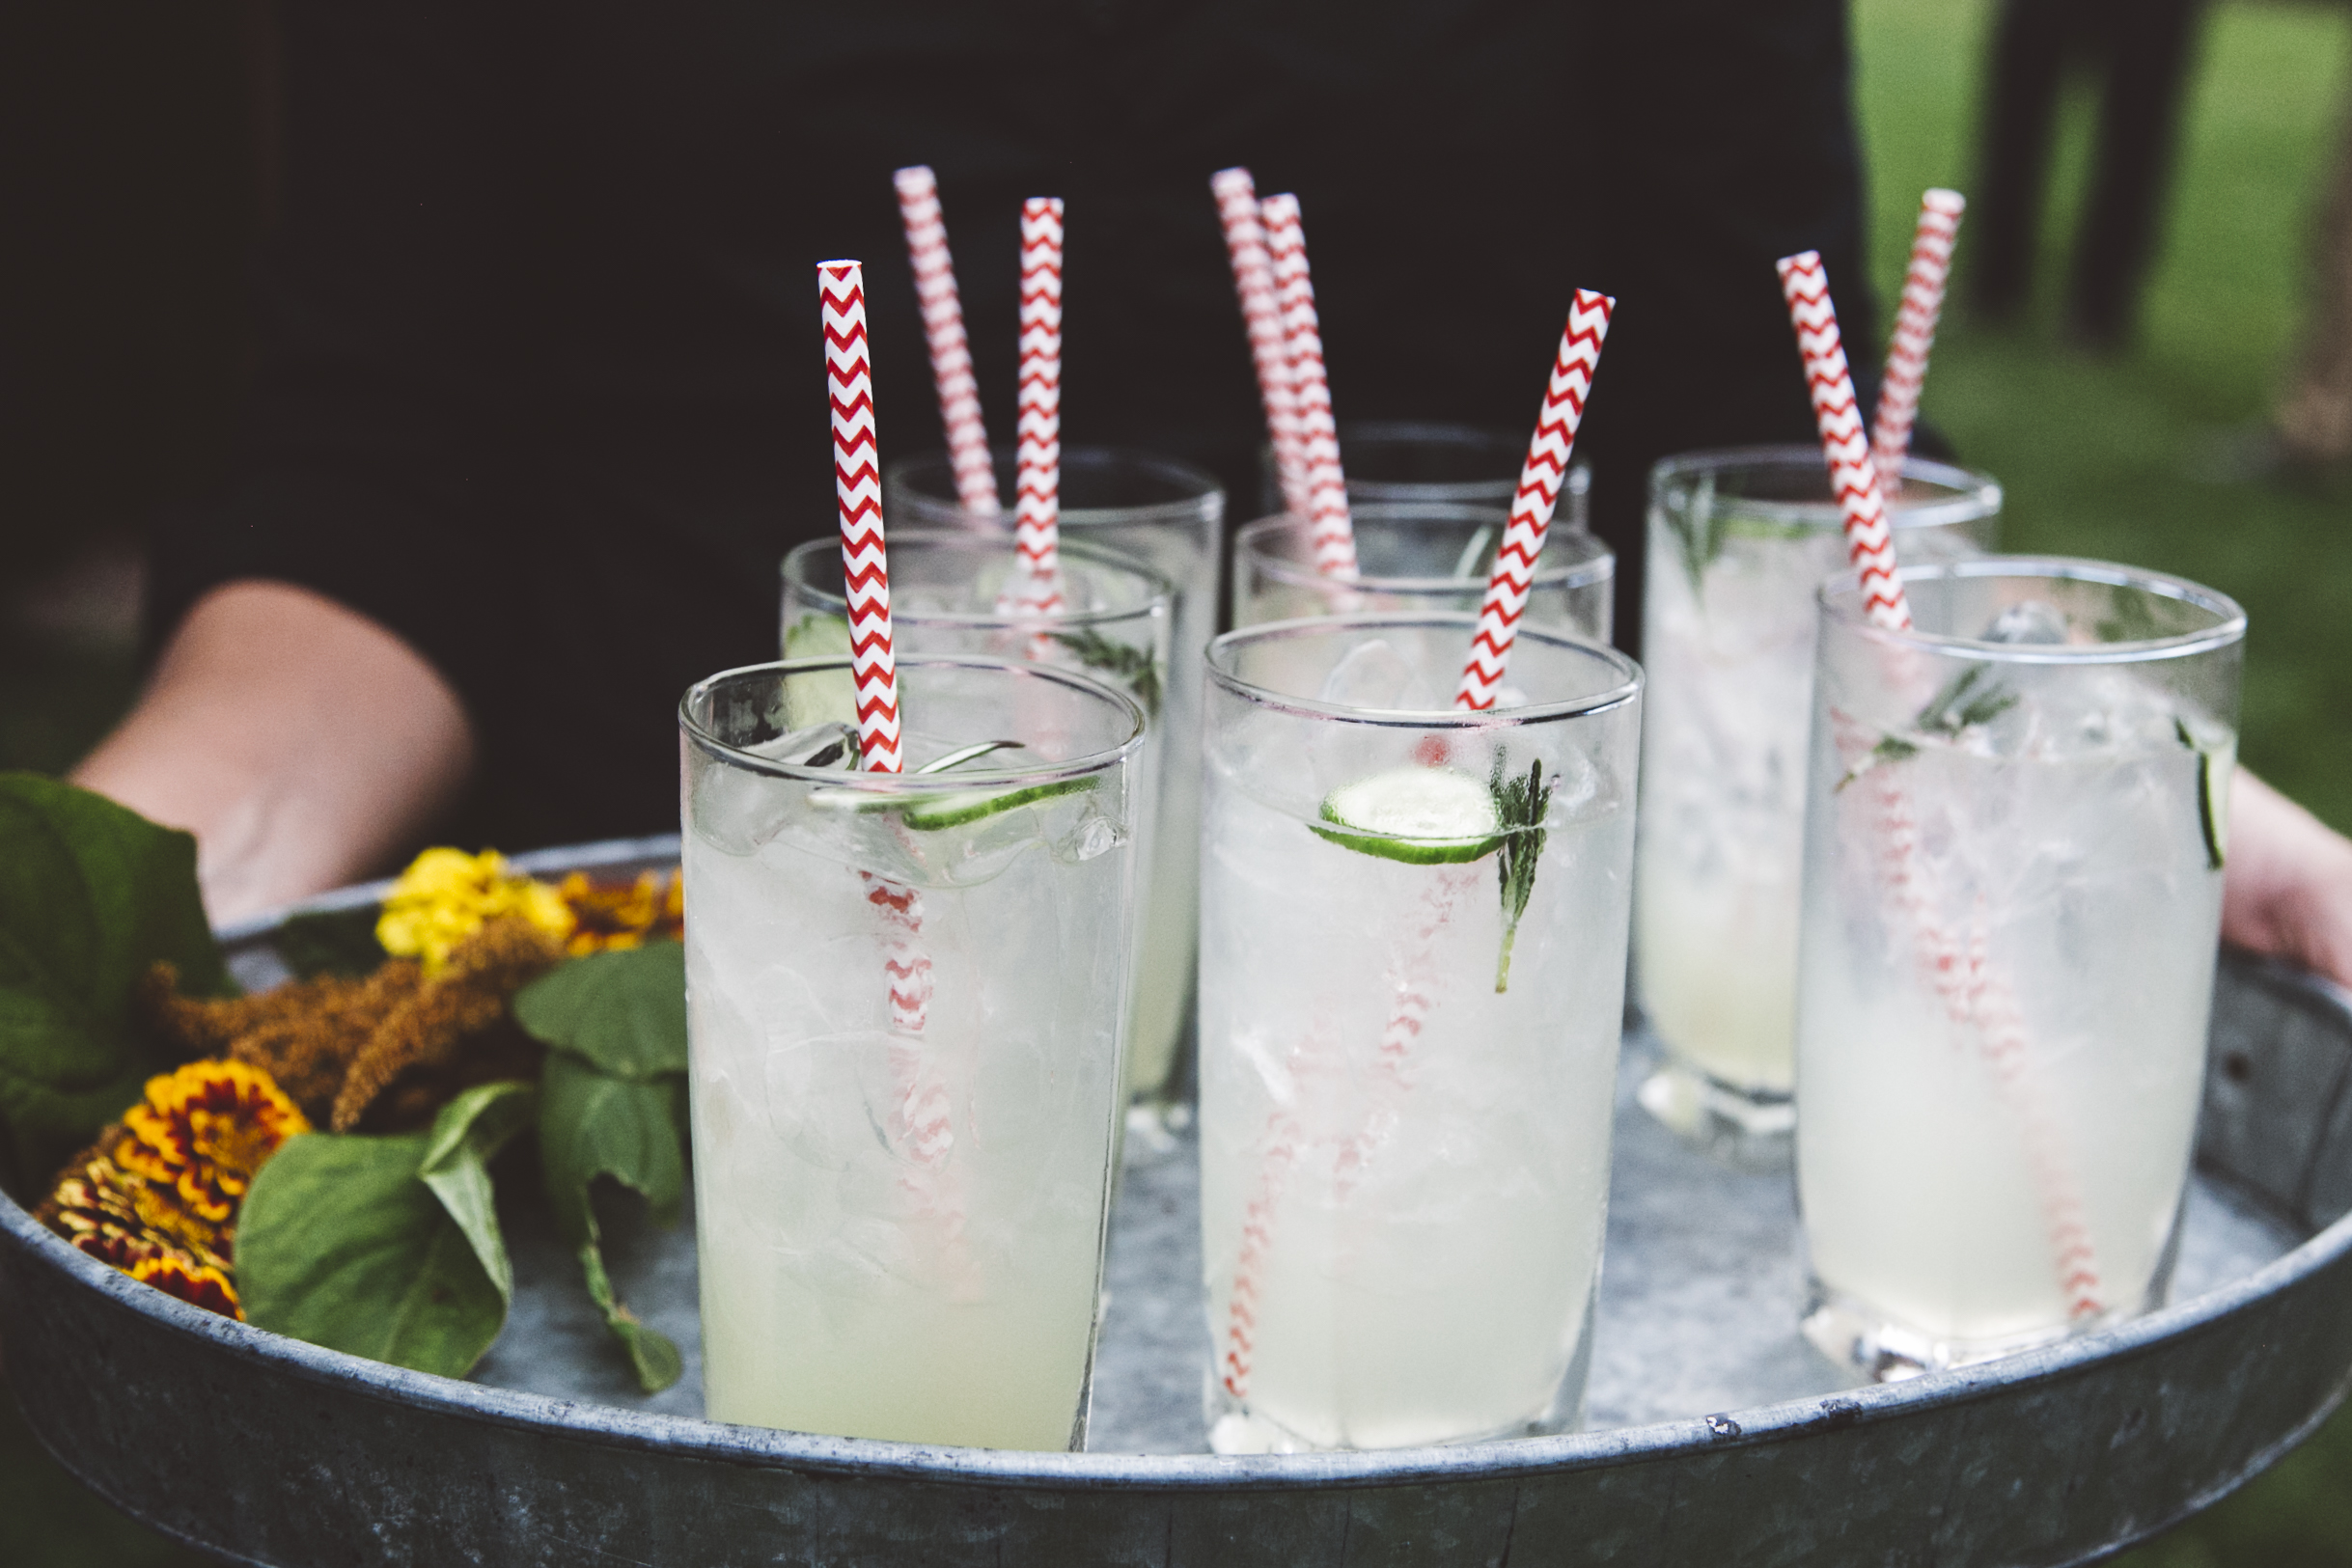 Cucumber-Rosemary Gin & Tonics © W  ylde Photography